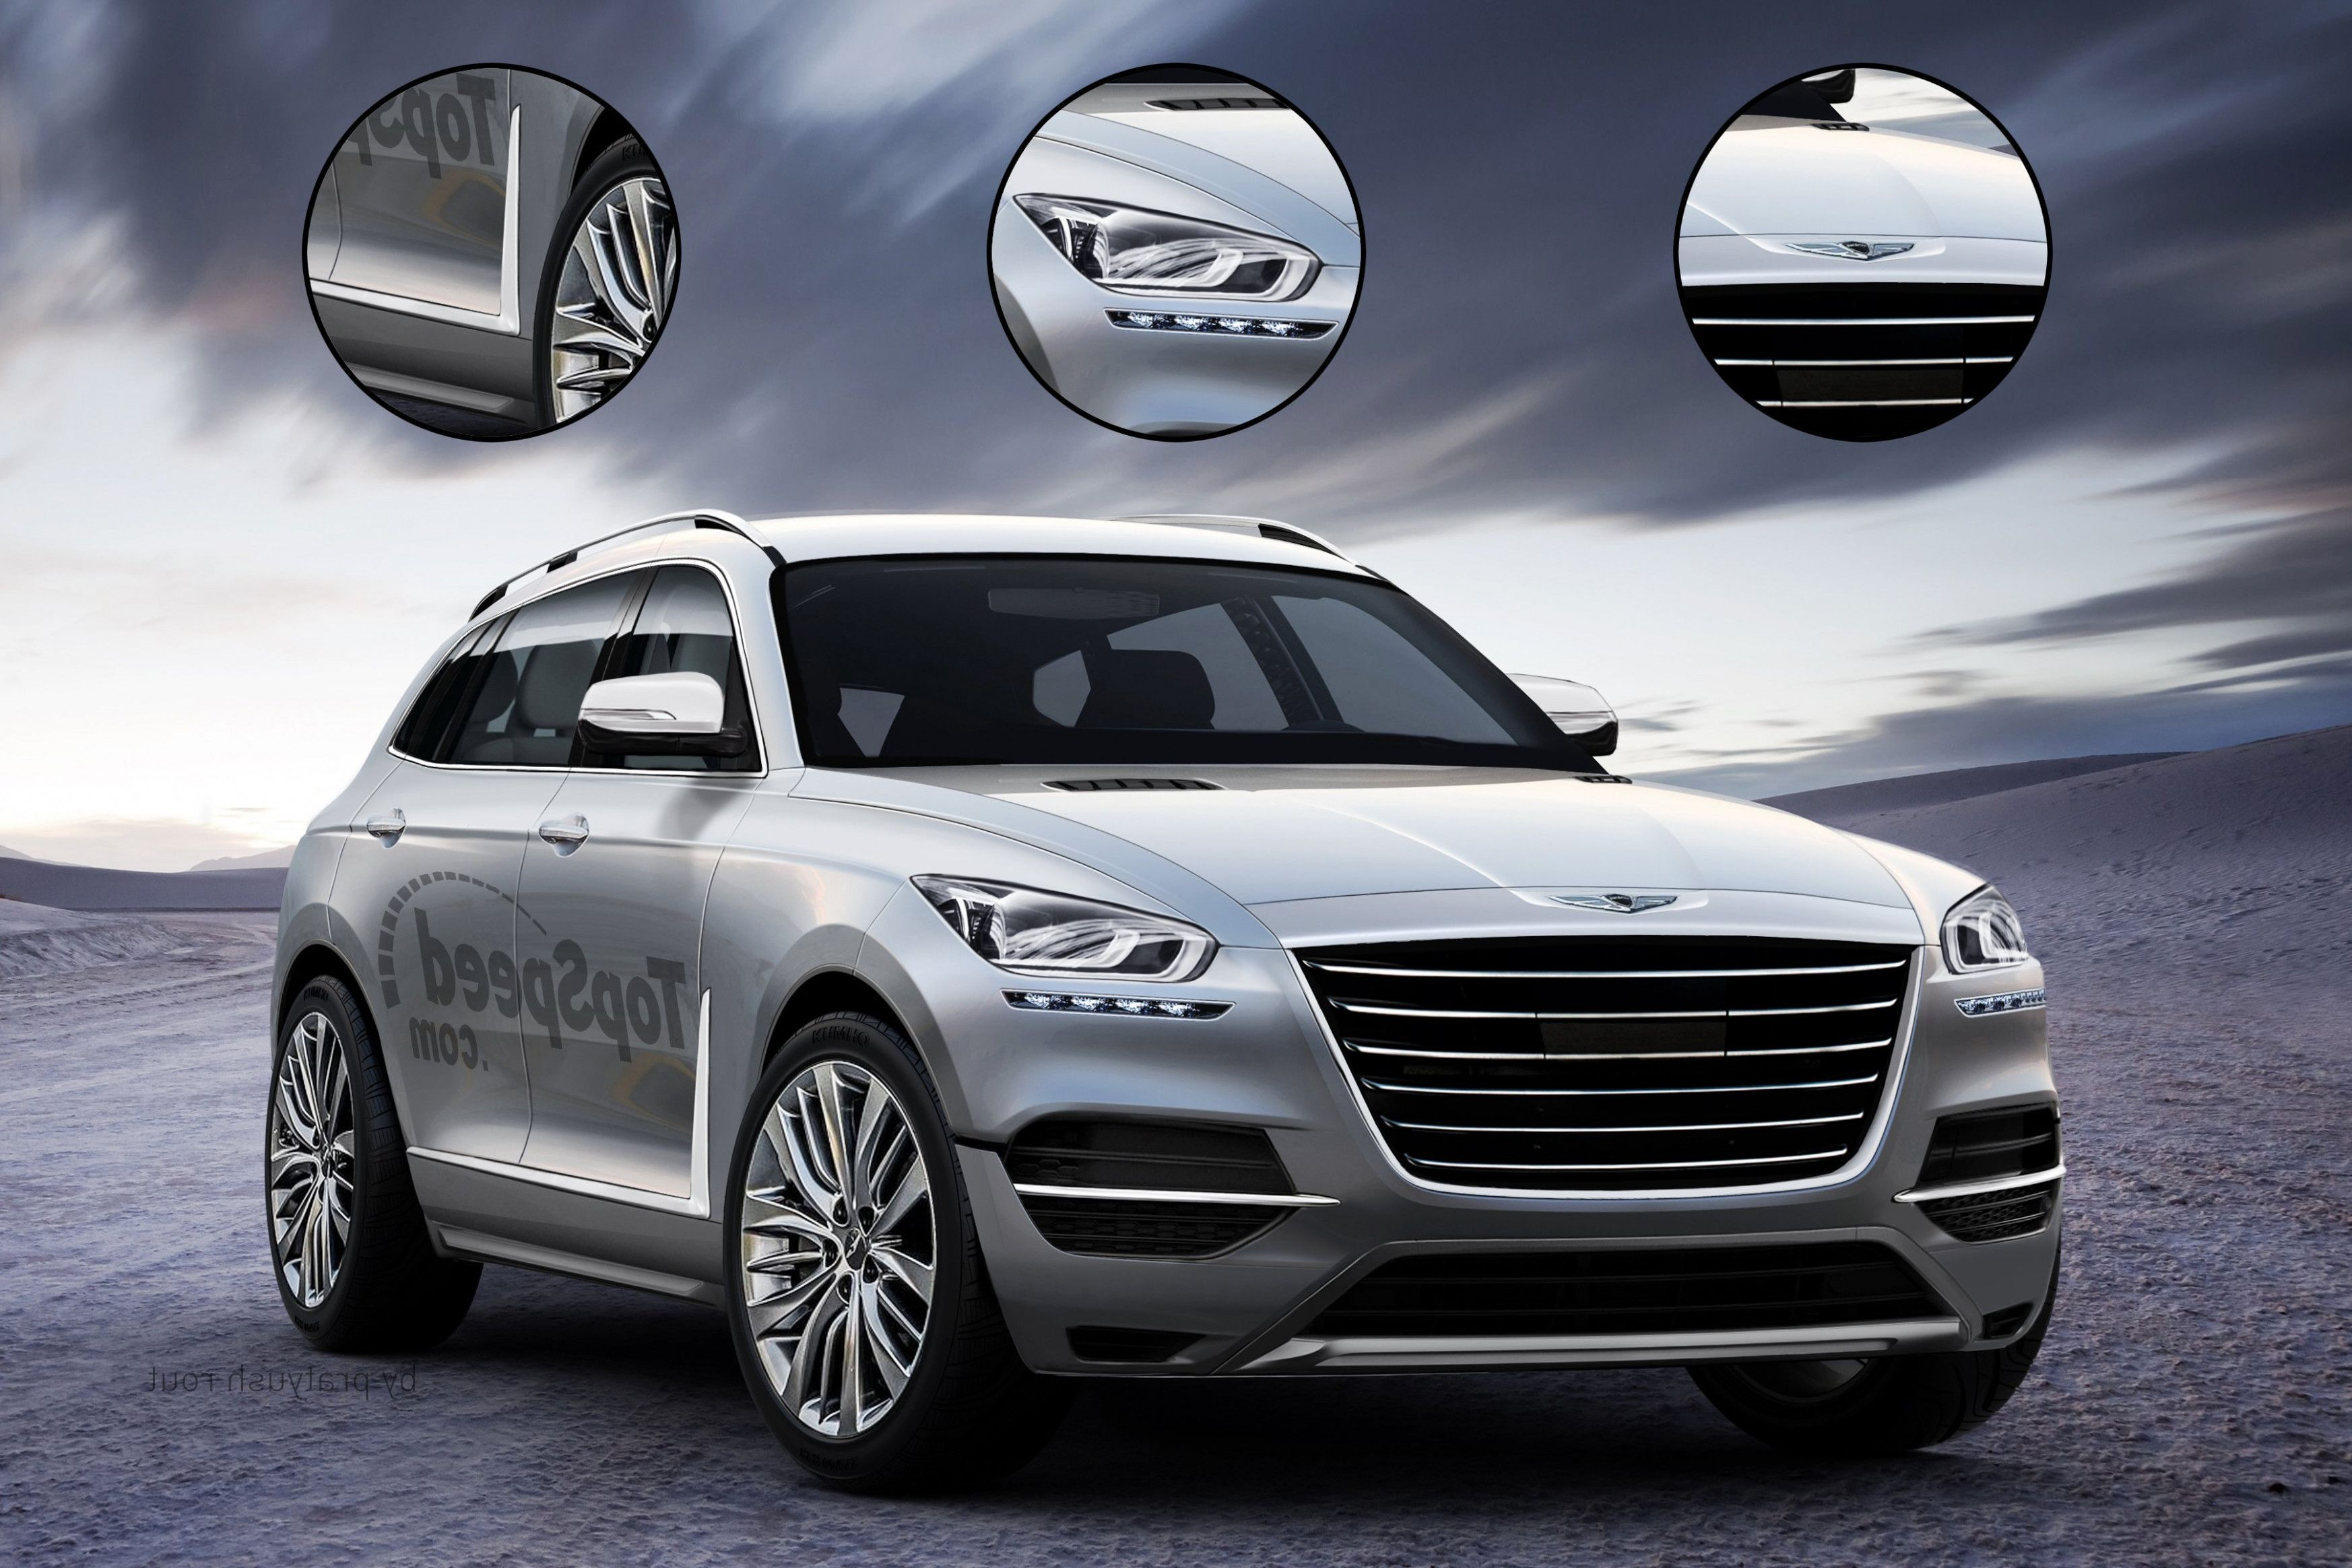 One Checklist That You Should Keep In Mind Before Attending Hyundai Genesis Suv 2020 Hyundai Genesis Hyundai Suv